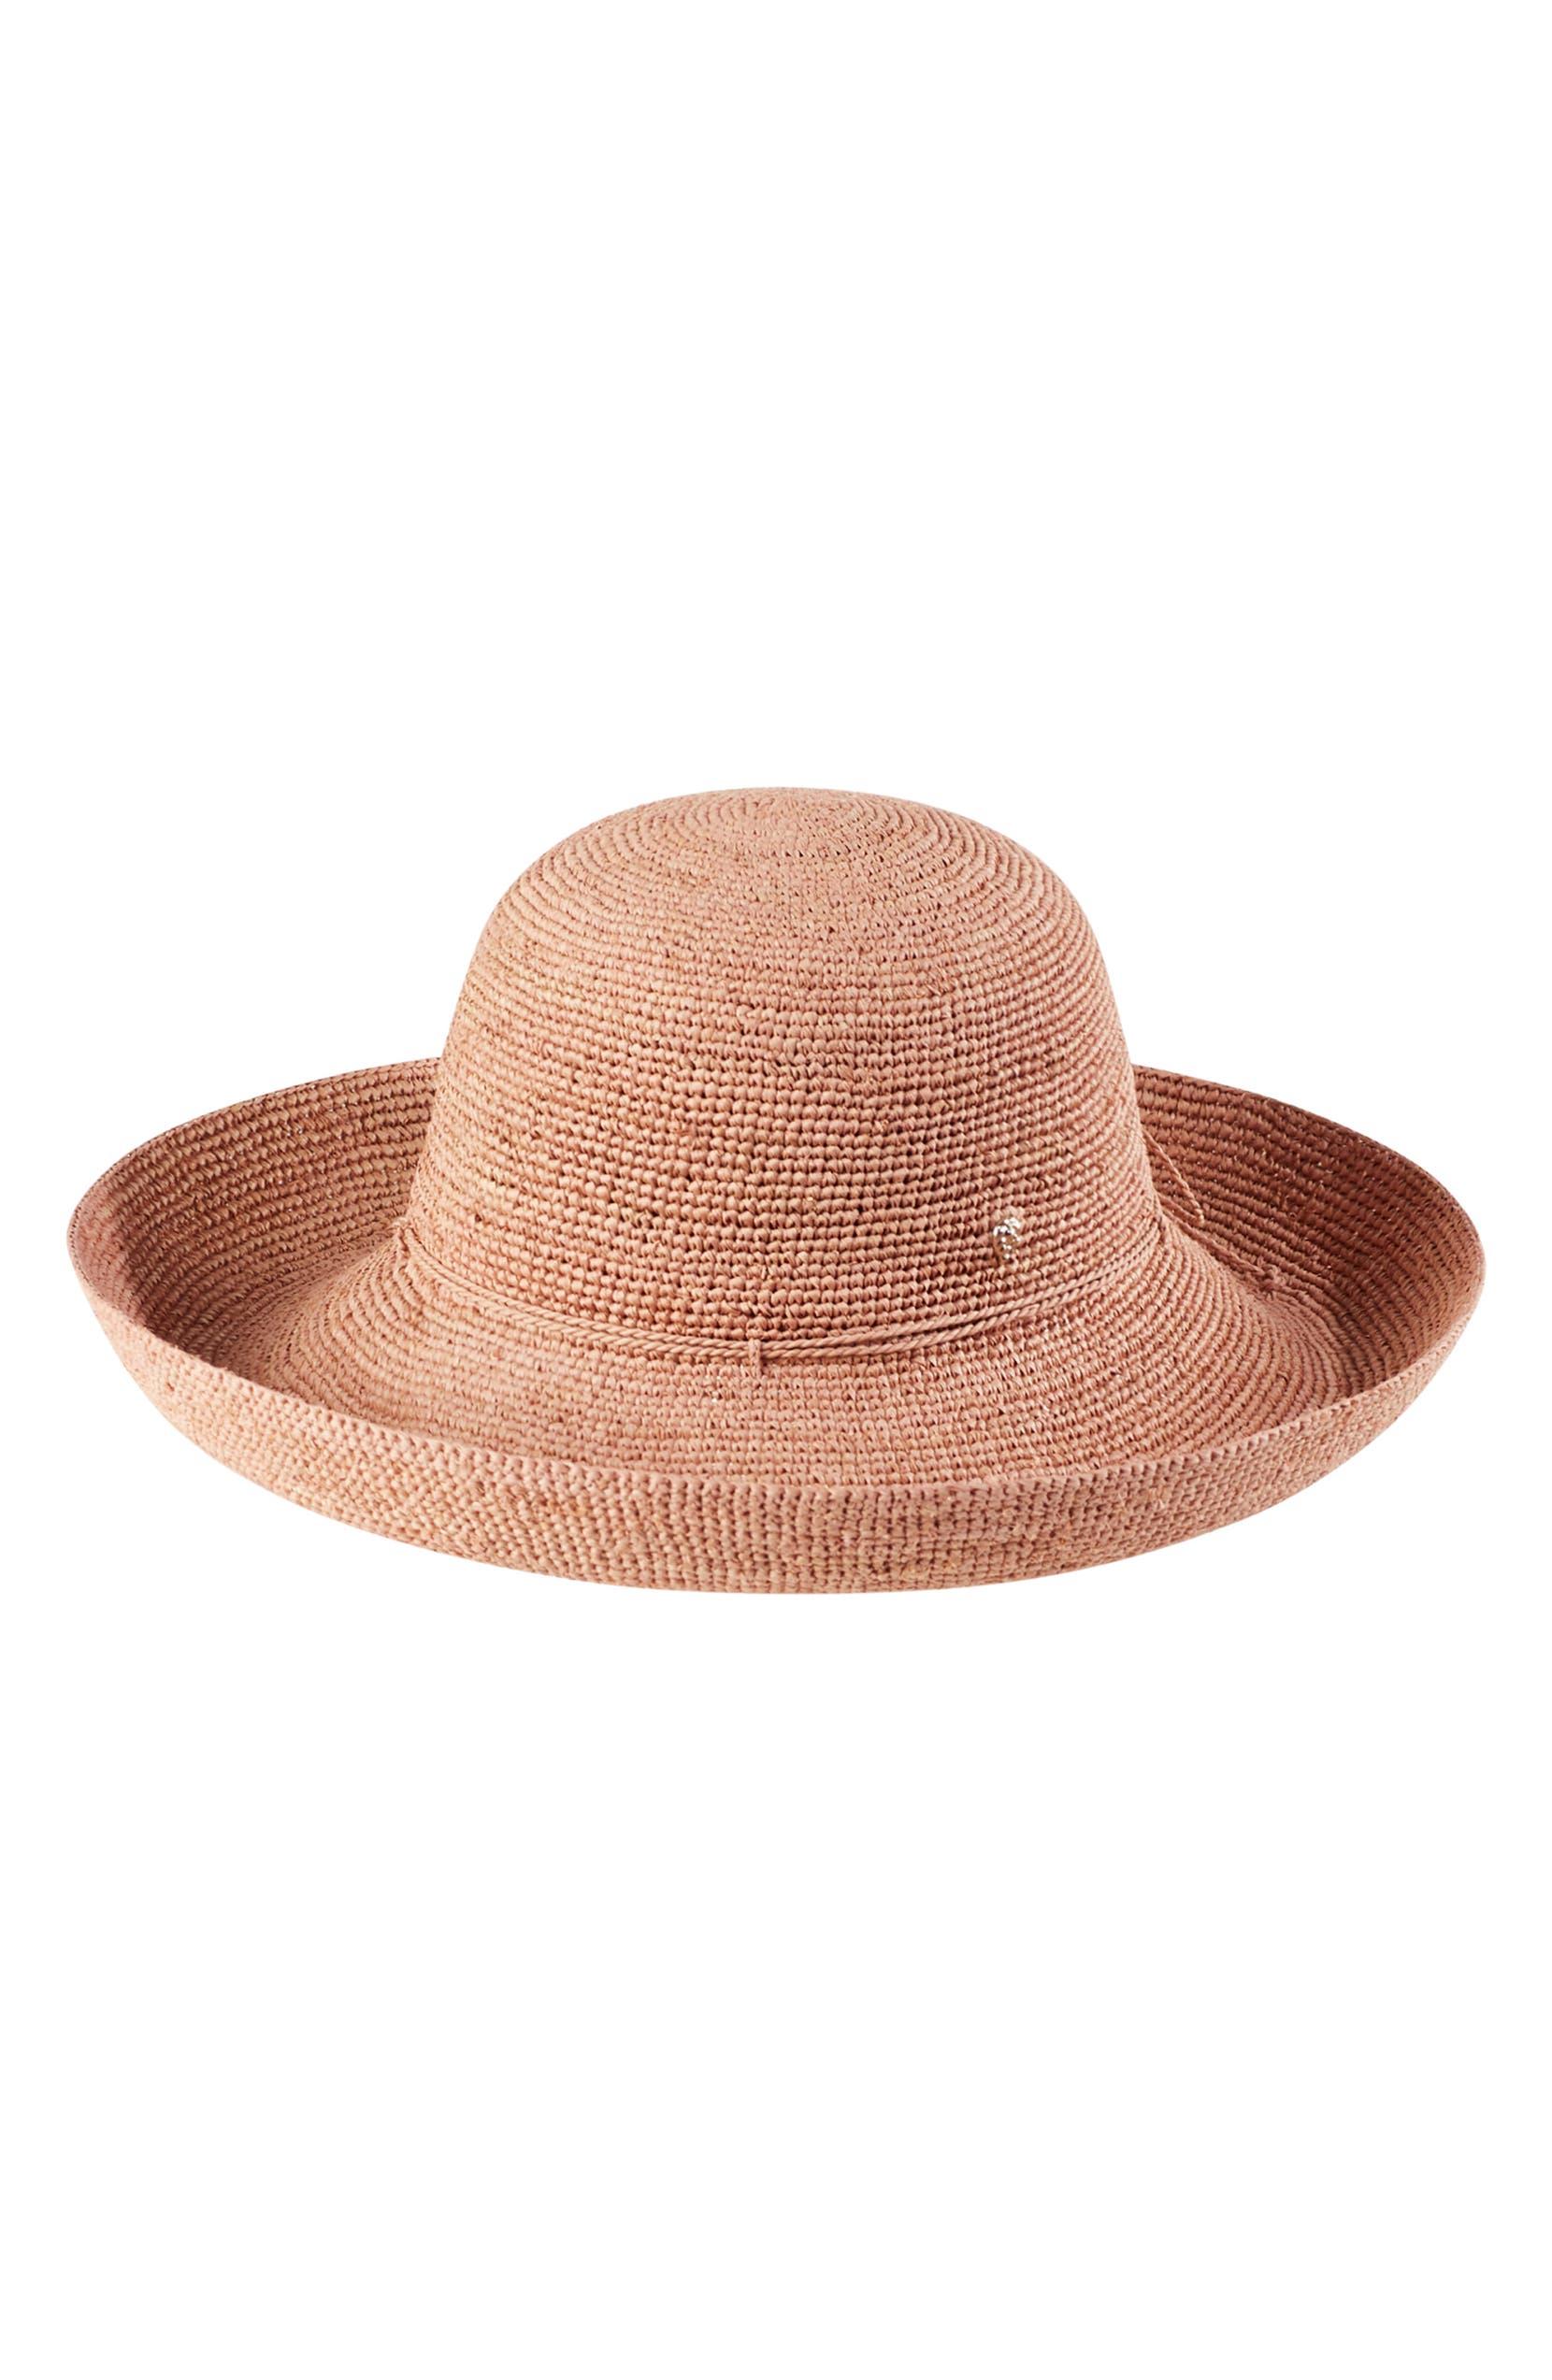 ad633334258b6f Helen Kaminski 'Provence 12' Packable Raffia Hat | Nordstrom